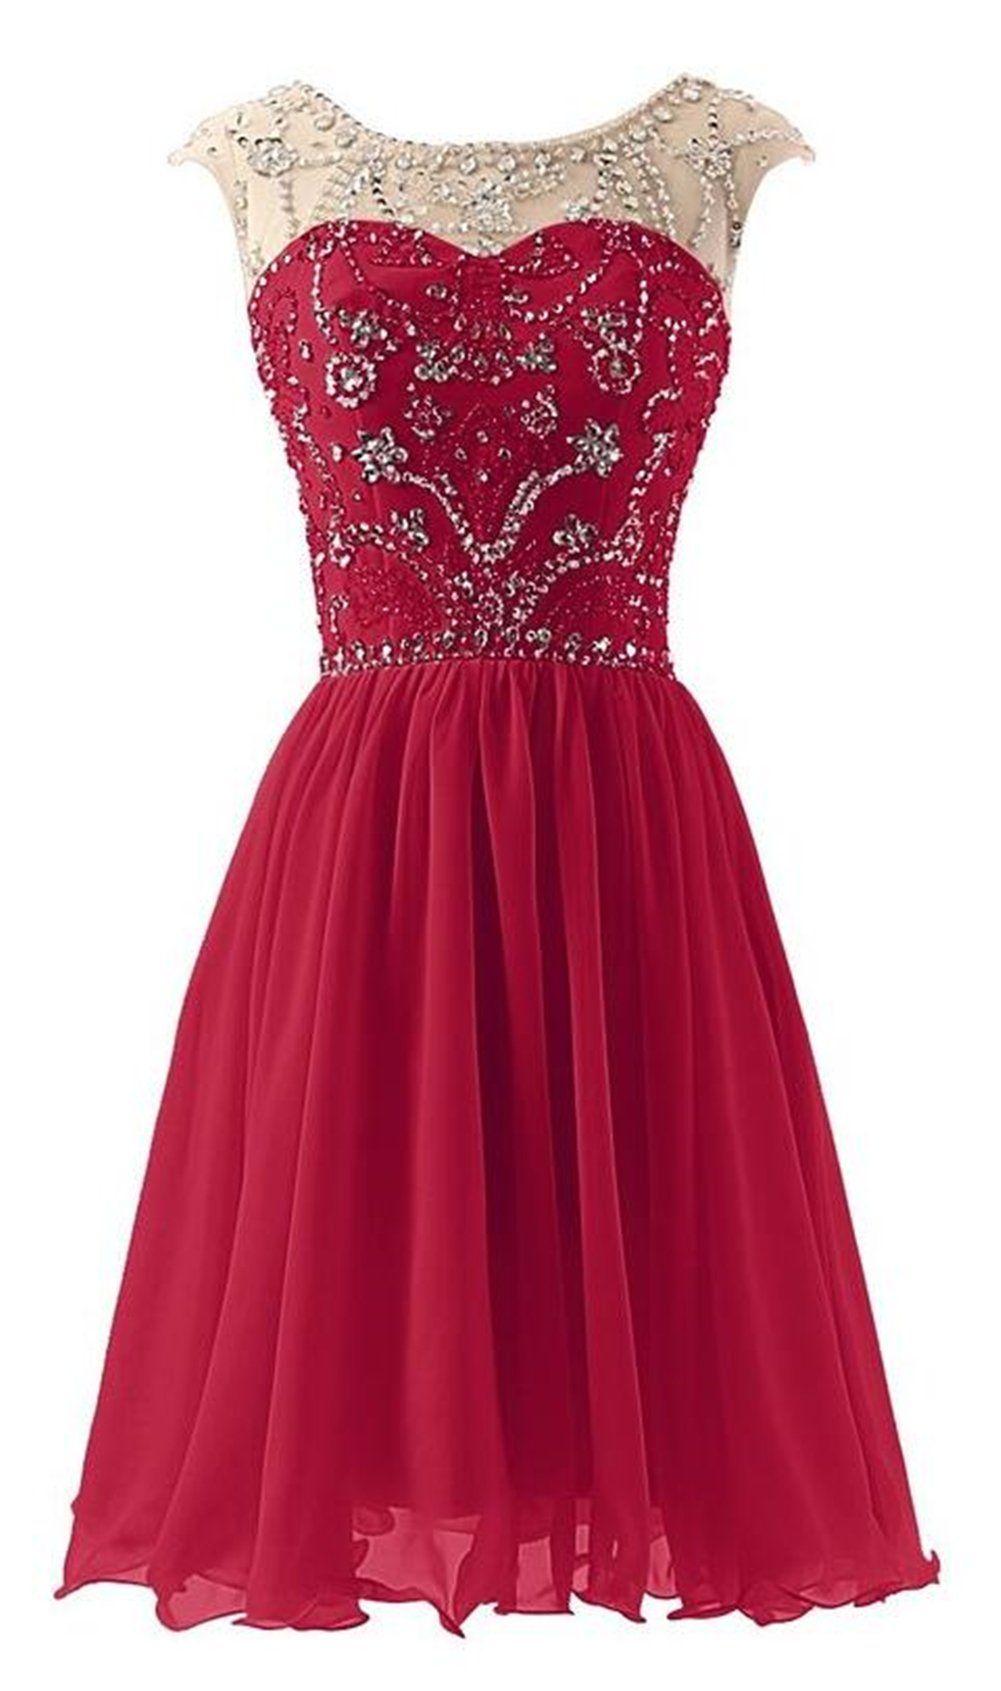 Endofjune short elegant sweetheart beaded formal homecoming dress us